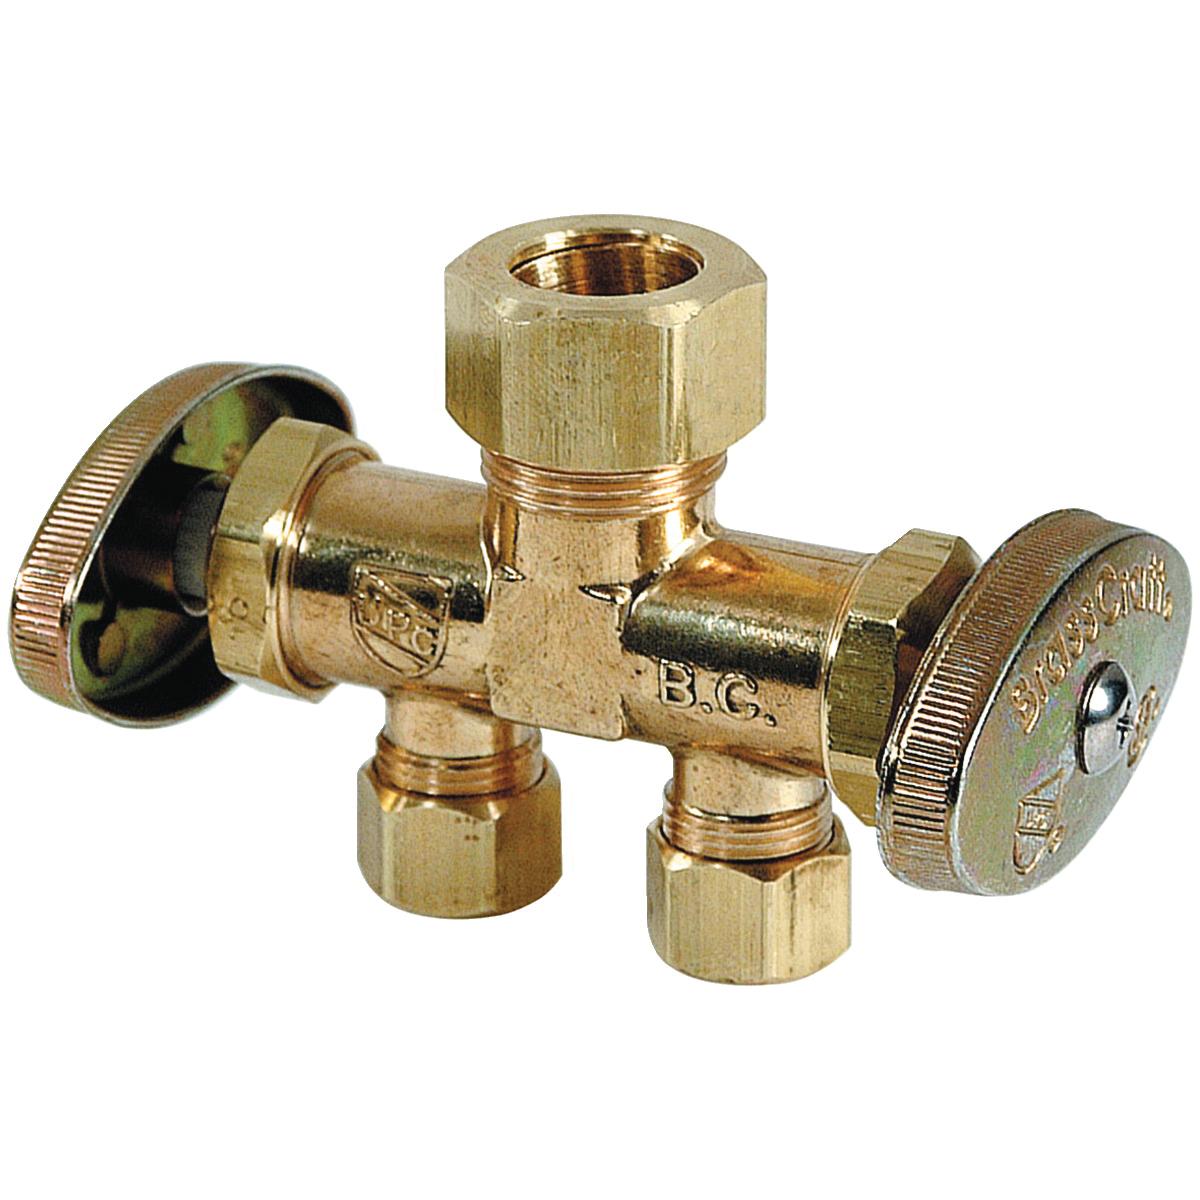 BrassCraft® CR1901DVSXR Brass Straight Supply Stop Valve, 1/2 in x 3/8 in x 3/8 in, Compression, 125 psi, 40 - 140 deg F